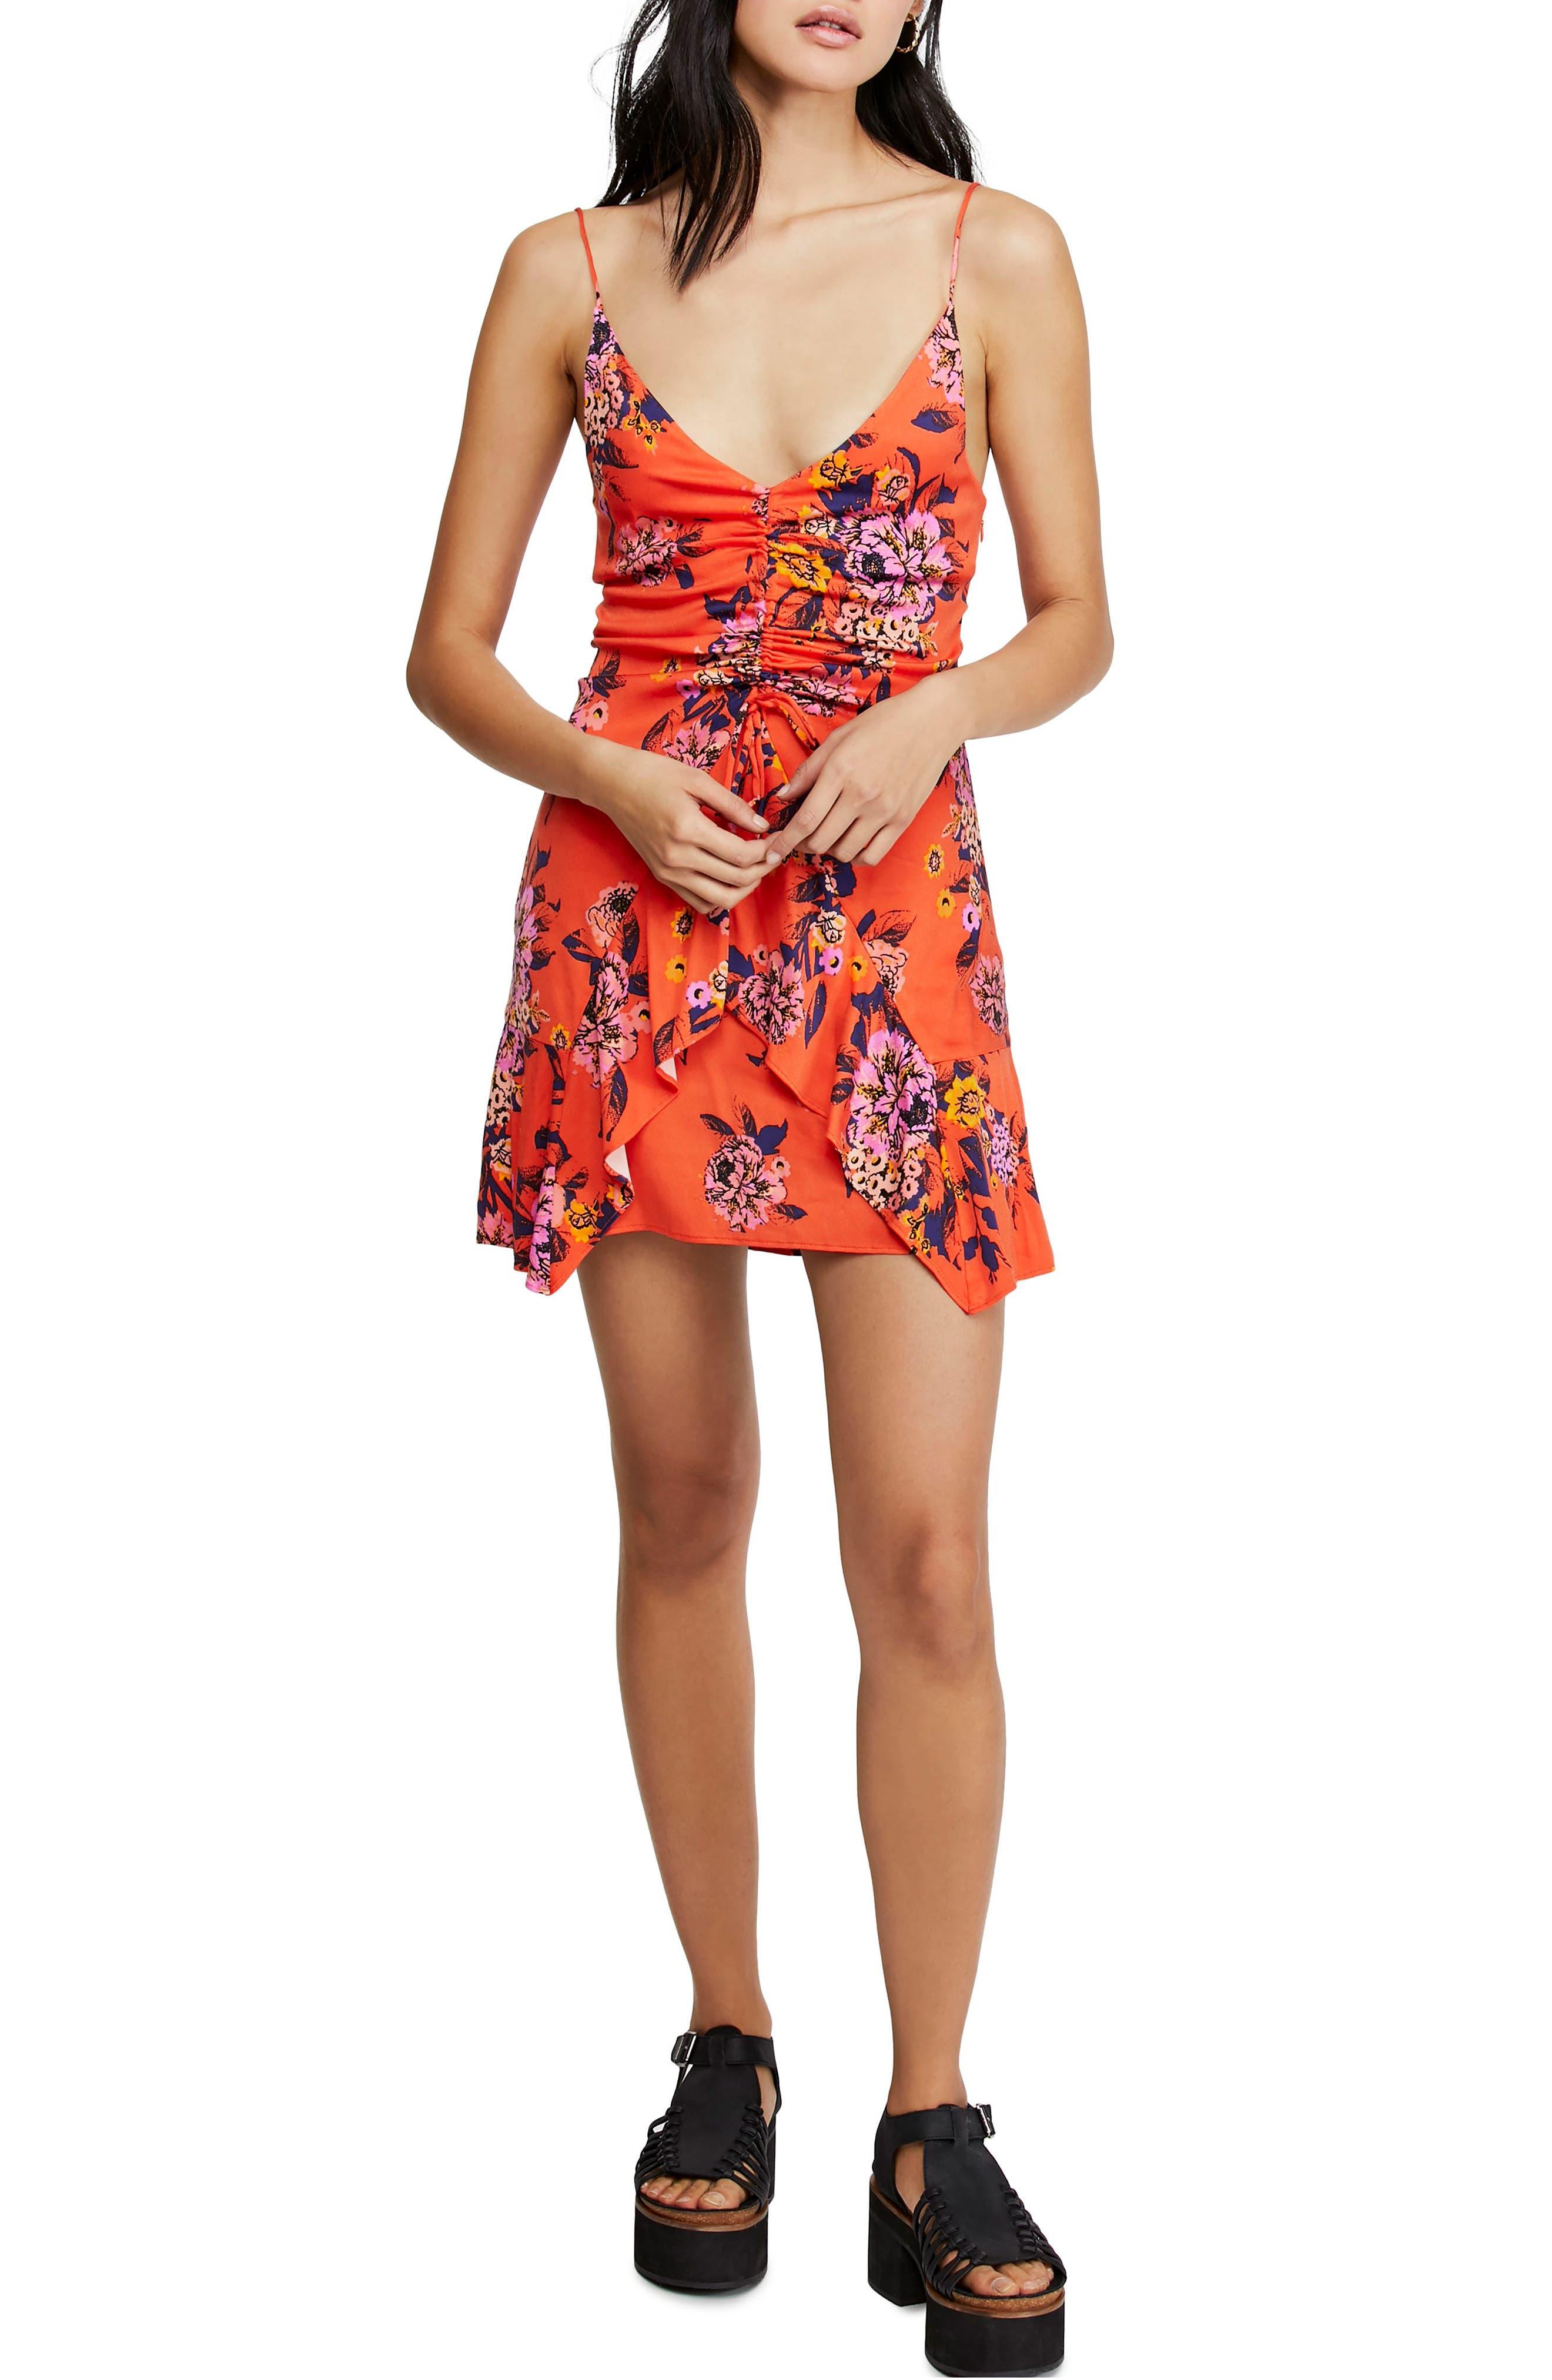 Free People Happy Heart Minidress, Orange